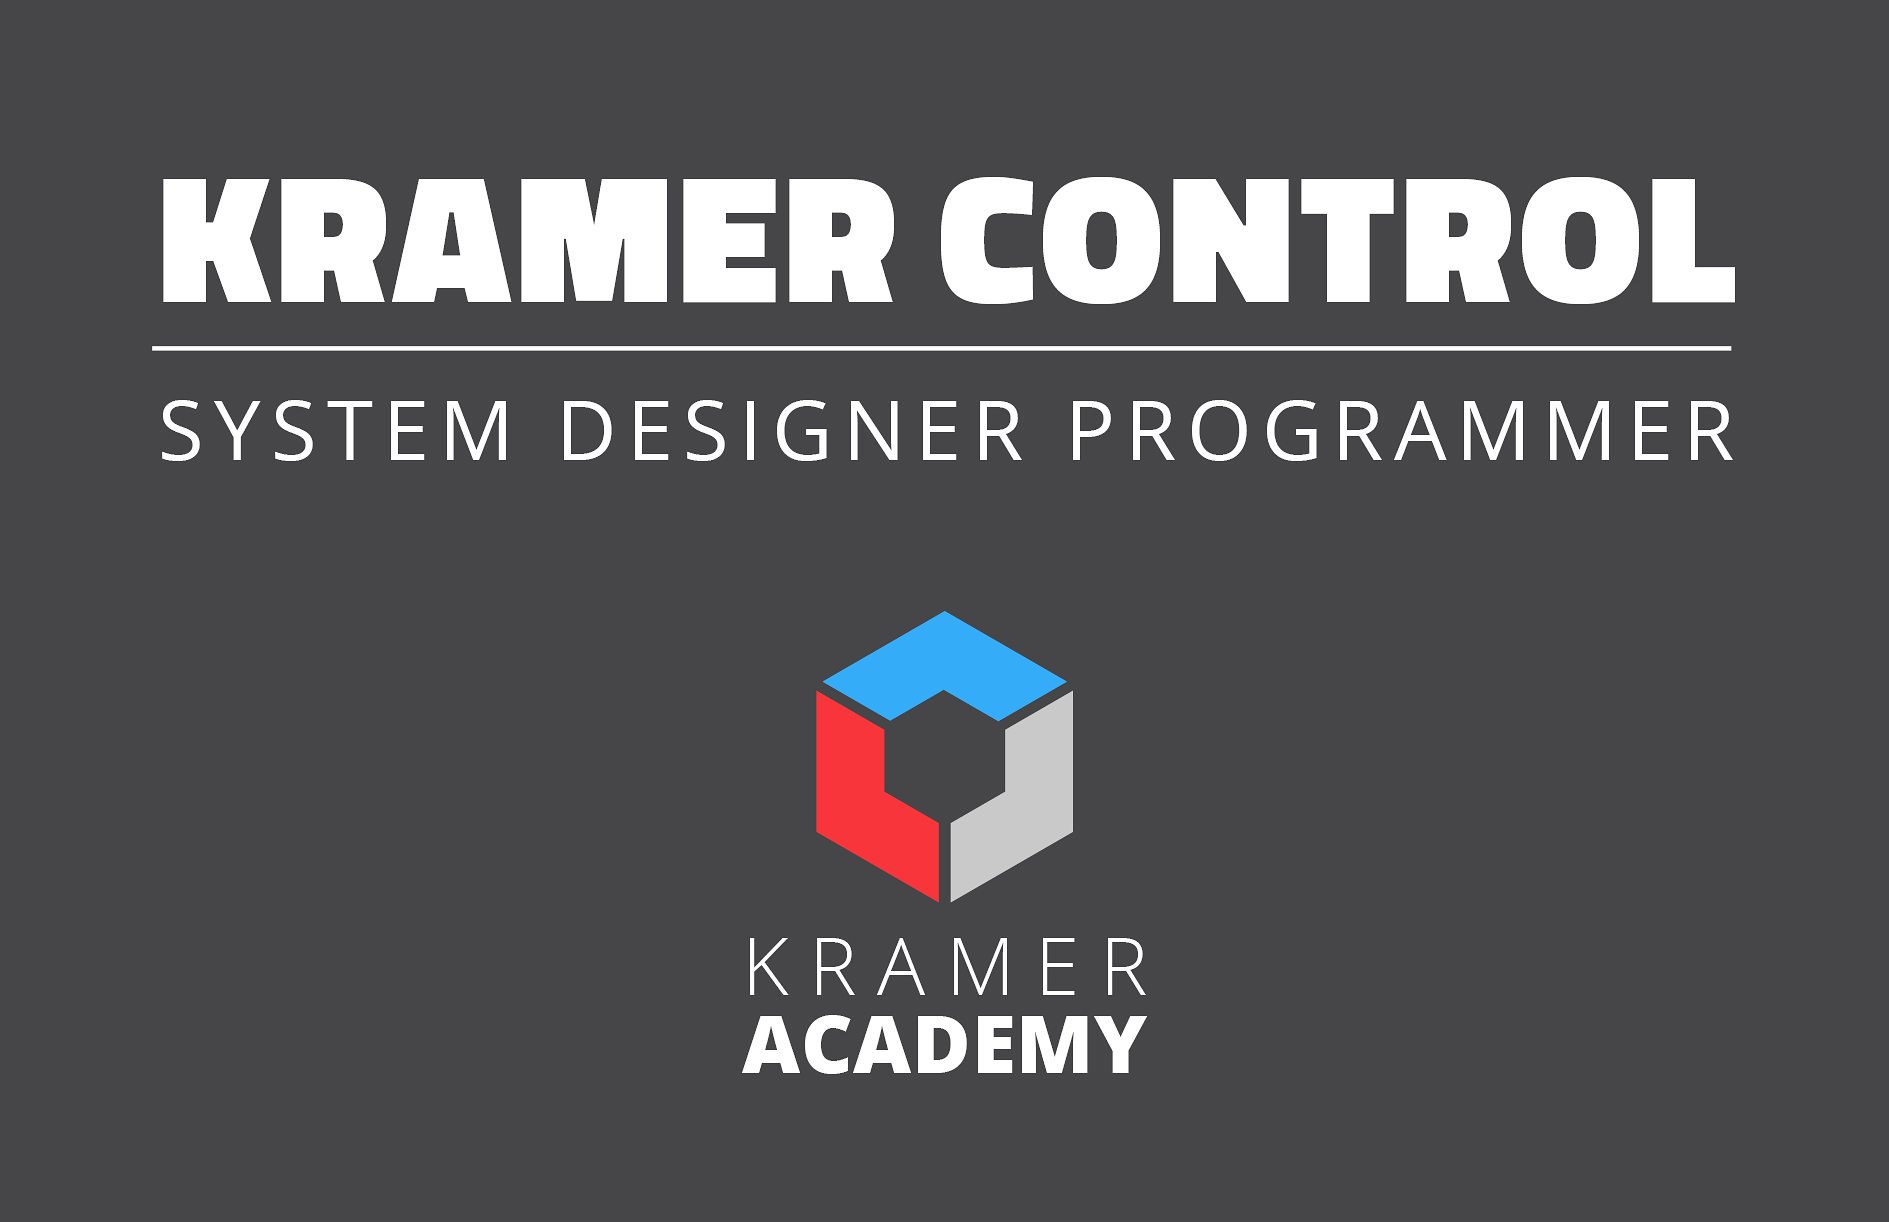 Kramer Control_Academy